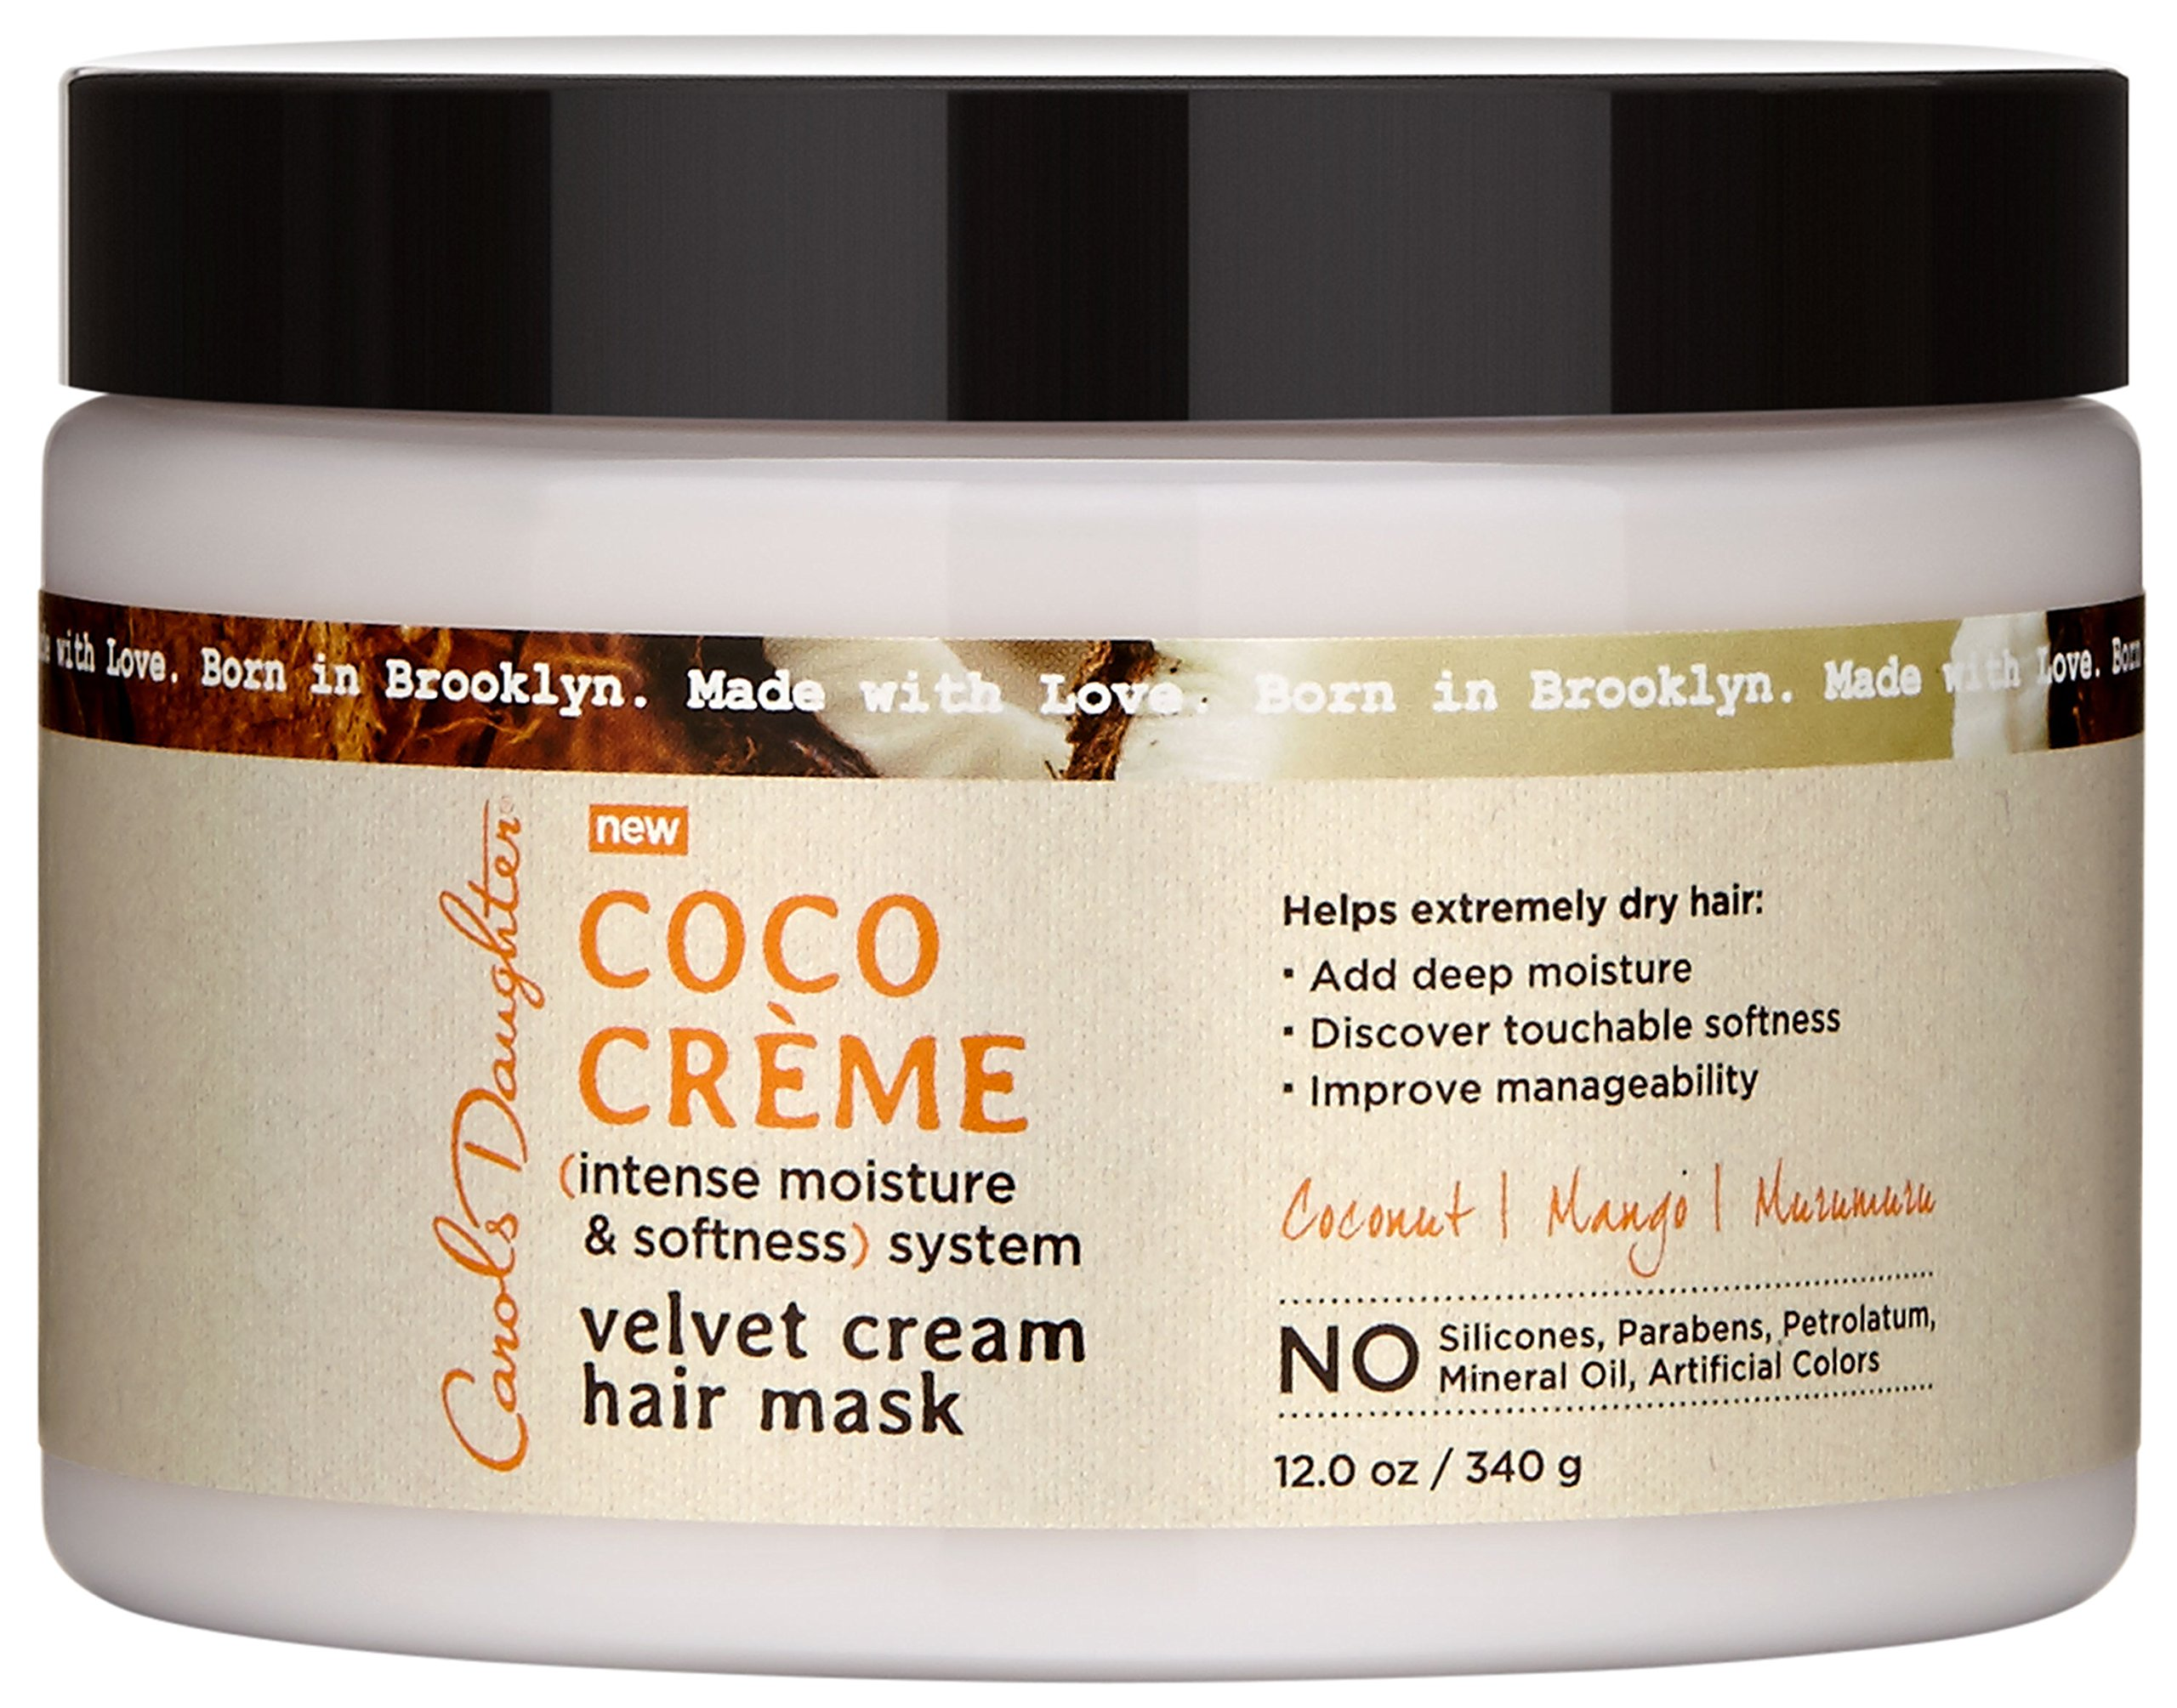 Carols Daughter Coco Creme Velvet Cream Hair Mask, 12 Ounce